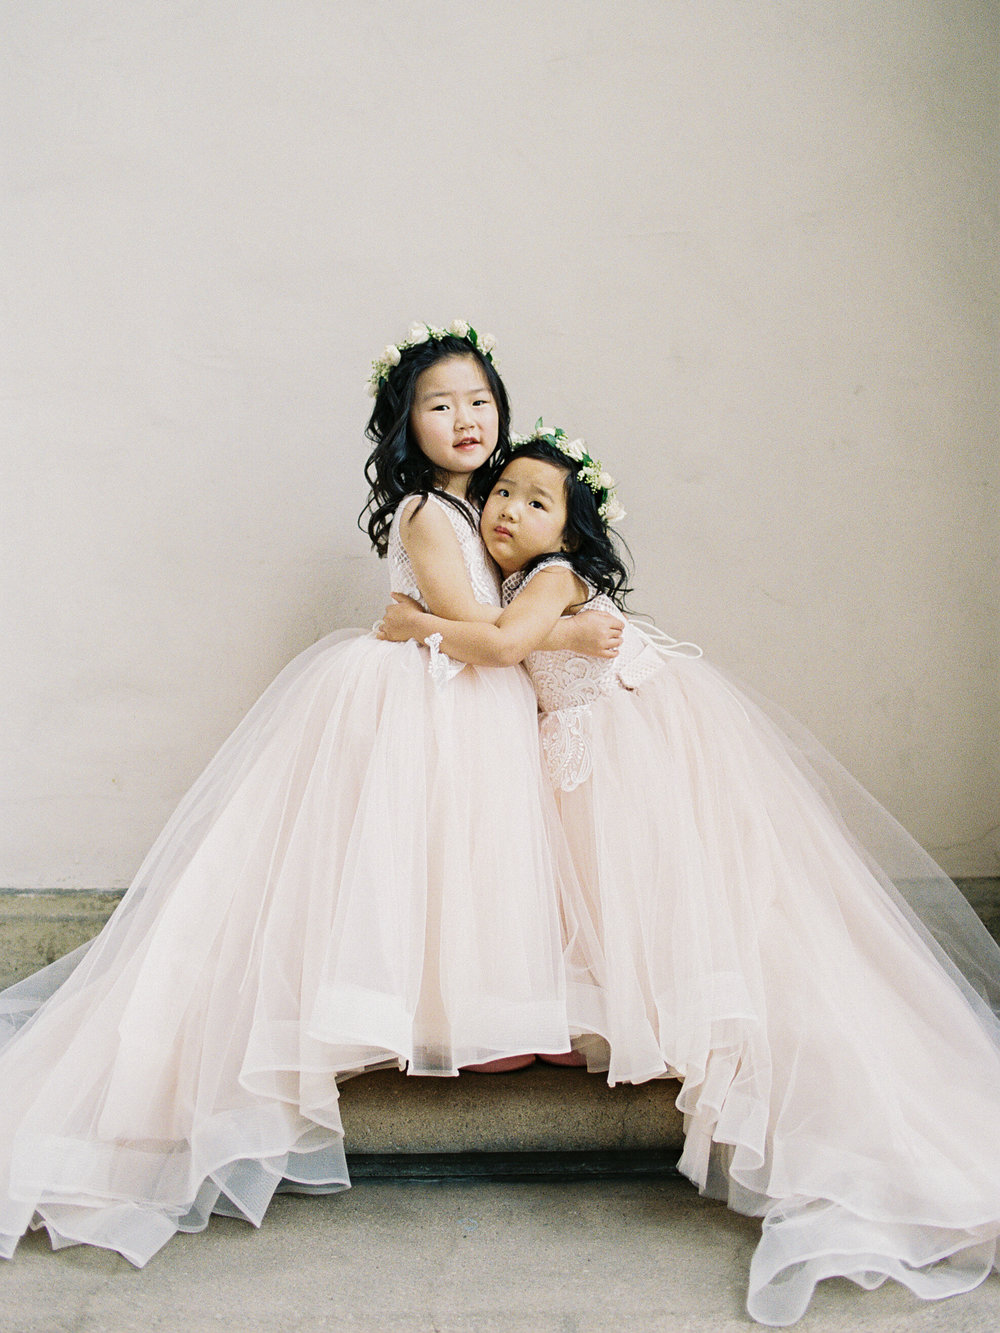 Athenaeum_Wedding_Hi_Res-10-Jen_Huang-005183-R1-030.jpg